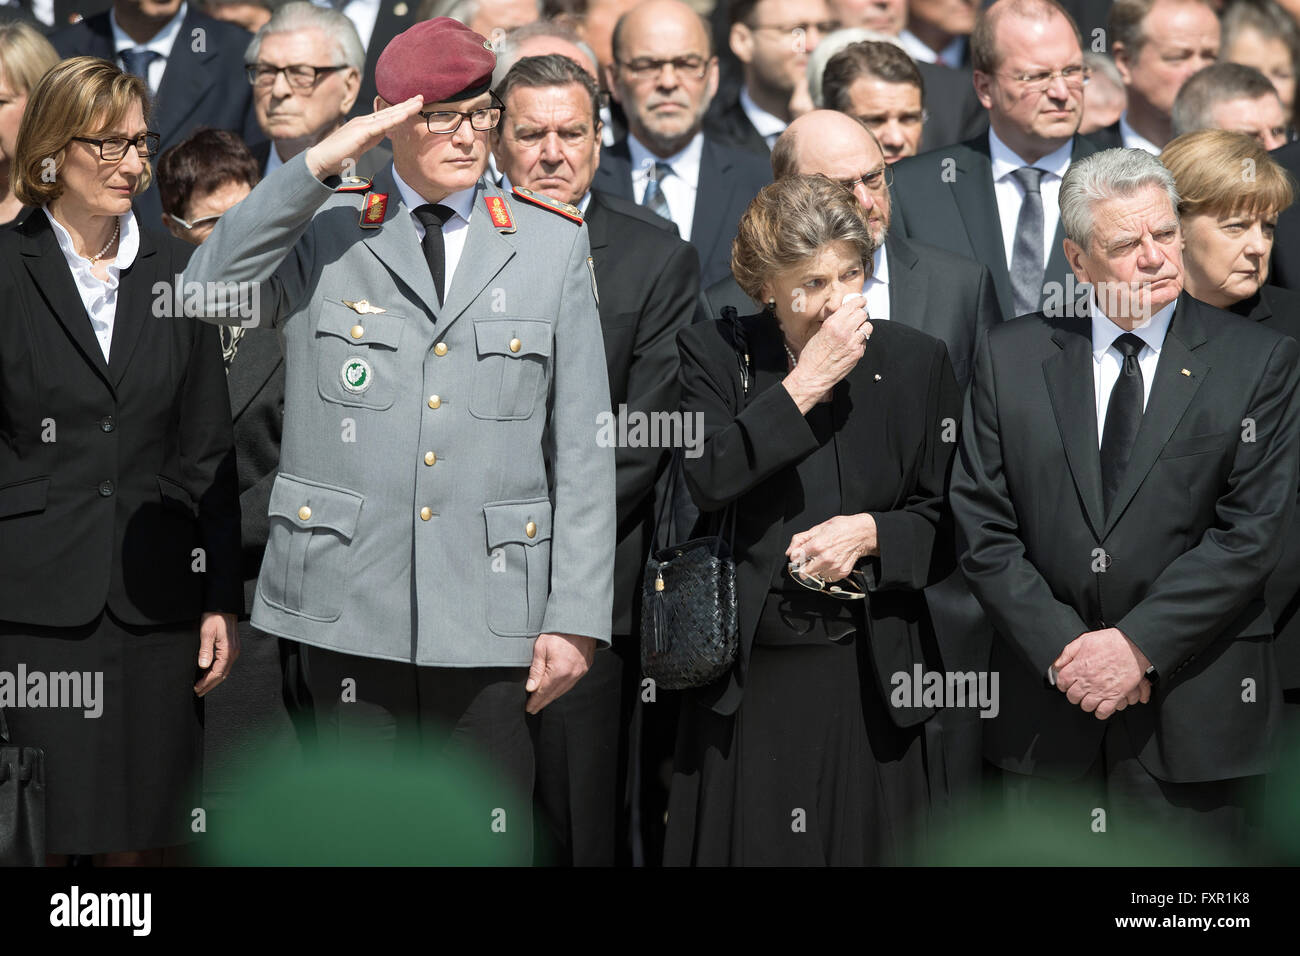 Bonn, Germany. 17th Apr, 2016. Martina Zudrop (L-R), daughter of former German foreign minister Hans-Dietrich Genscher, - Stock Image